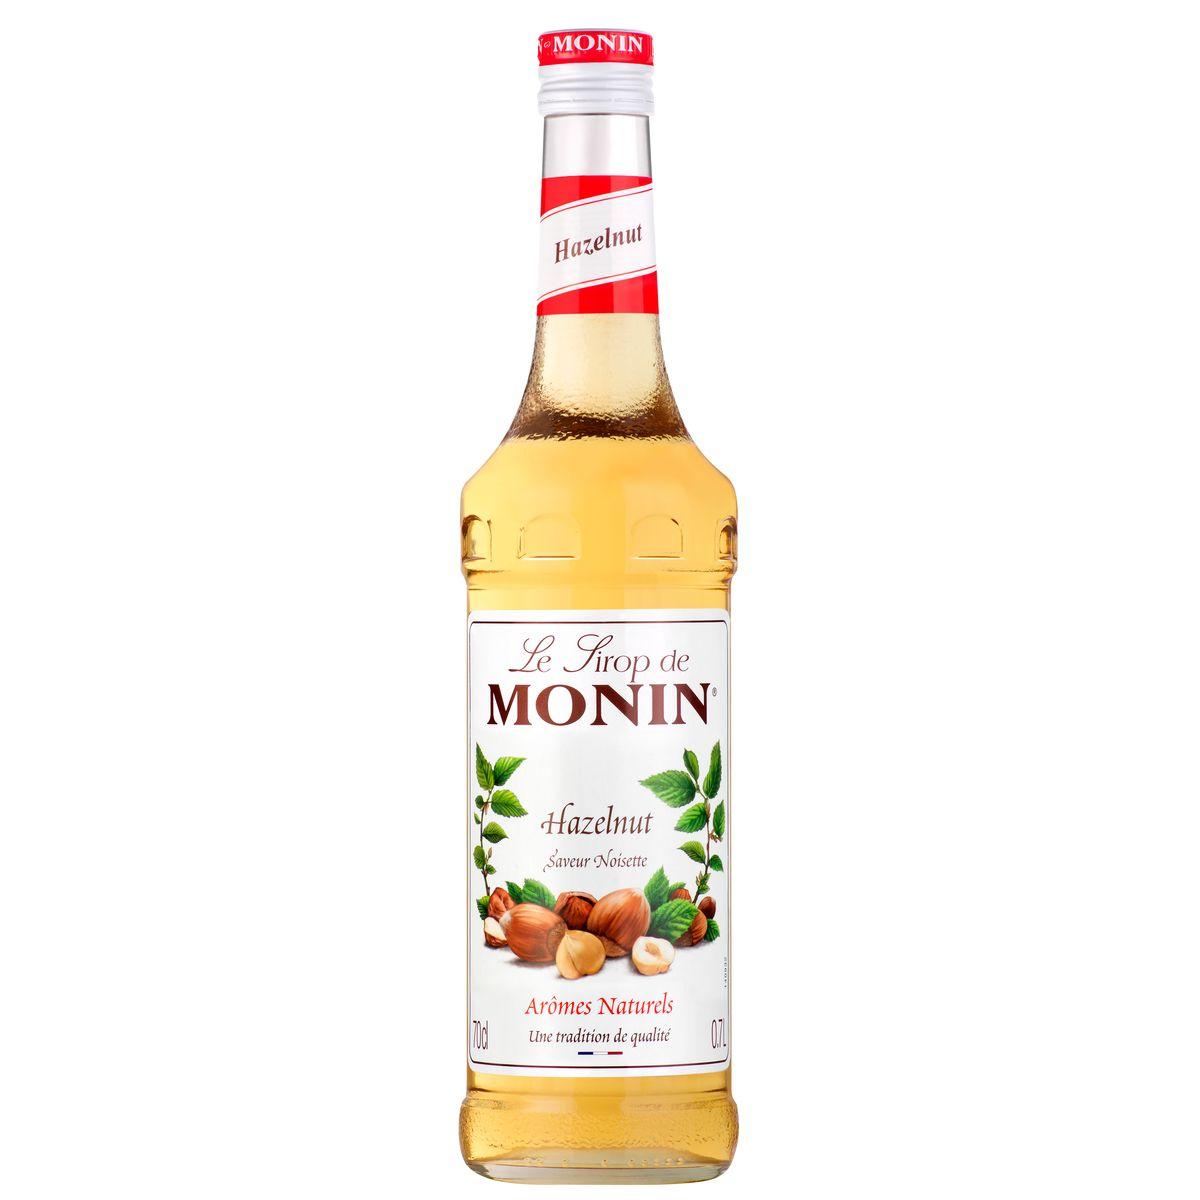 Sirop noisette 70cl - Monin